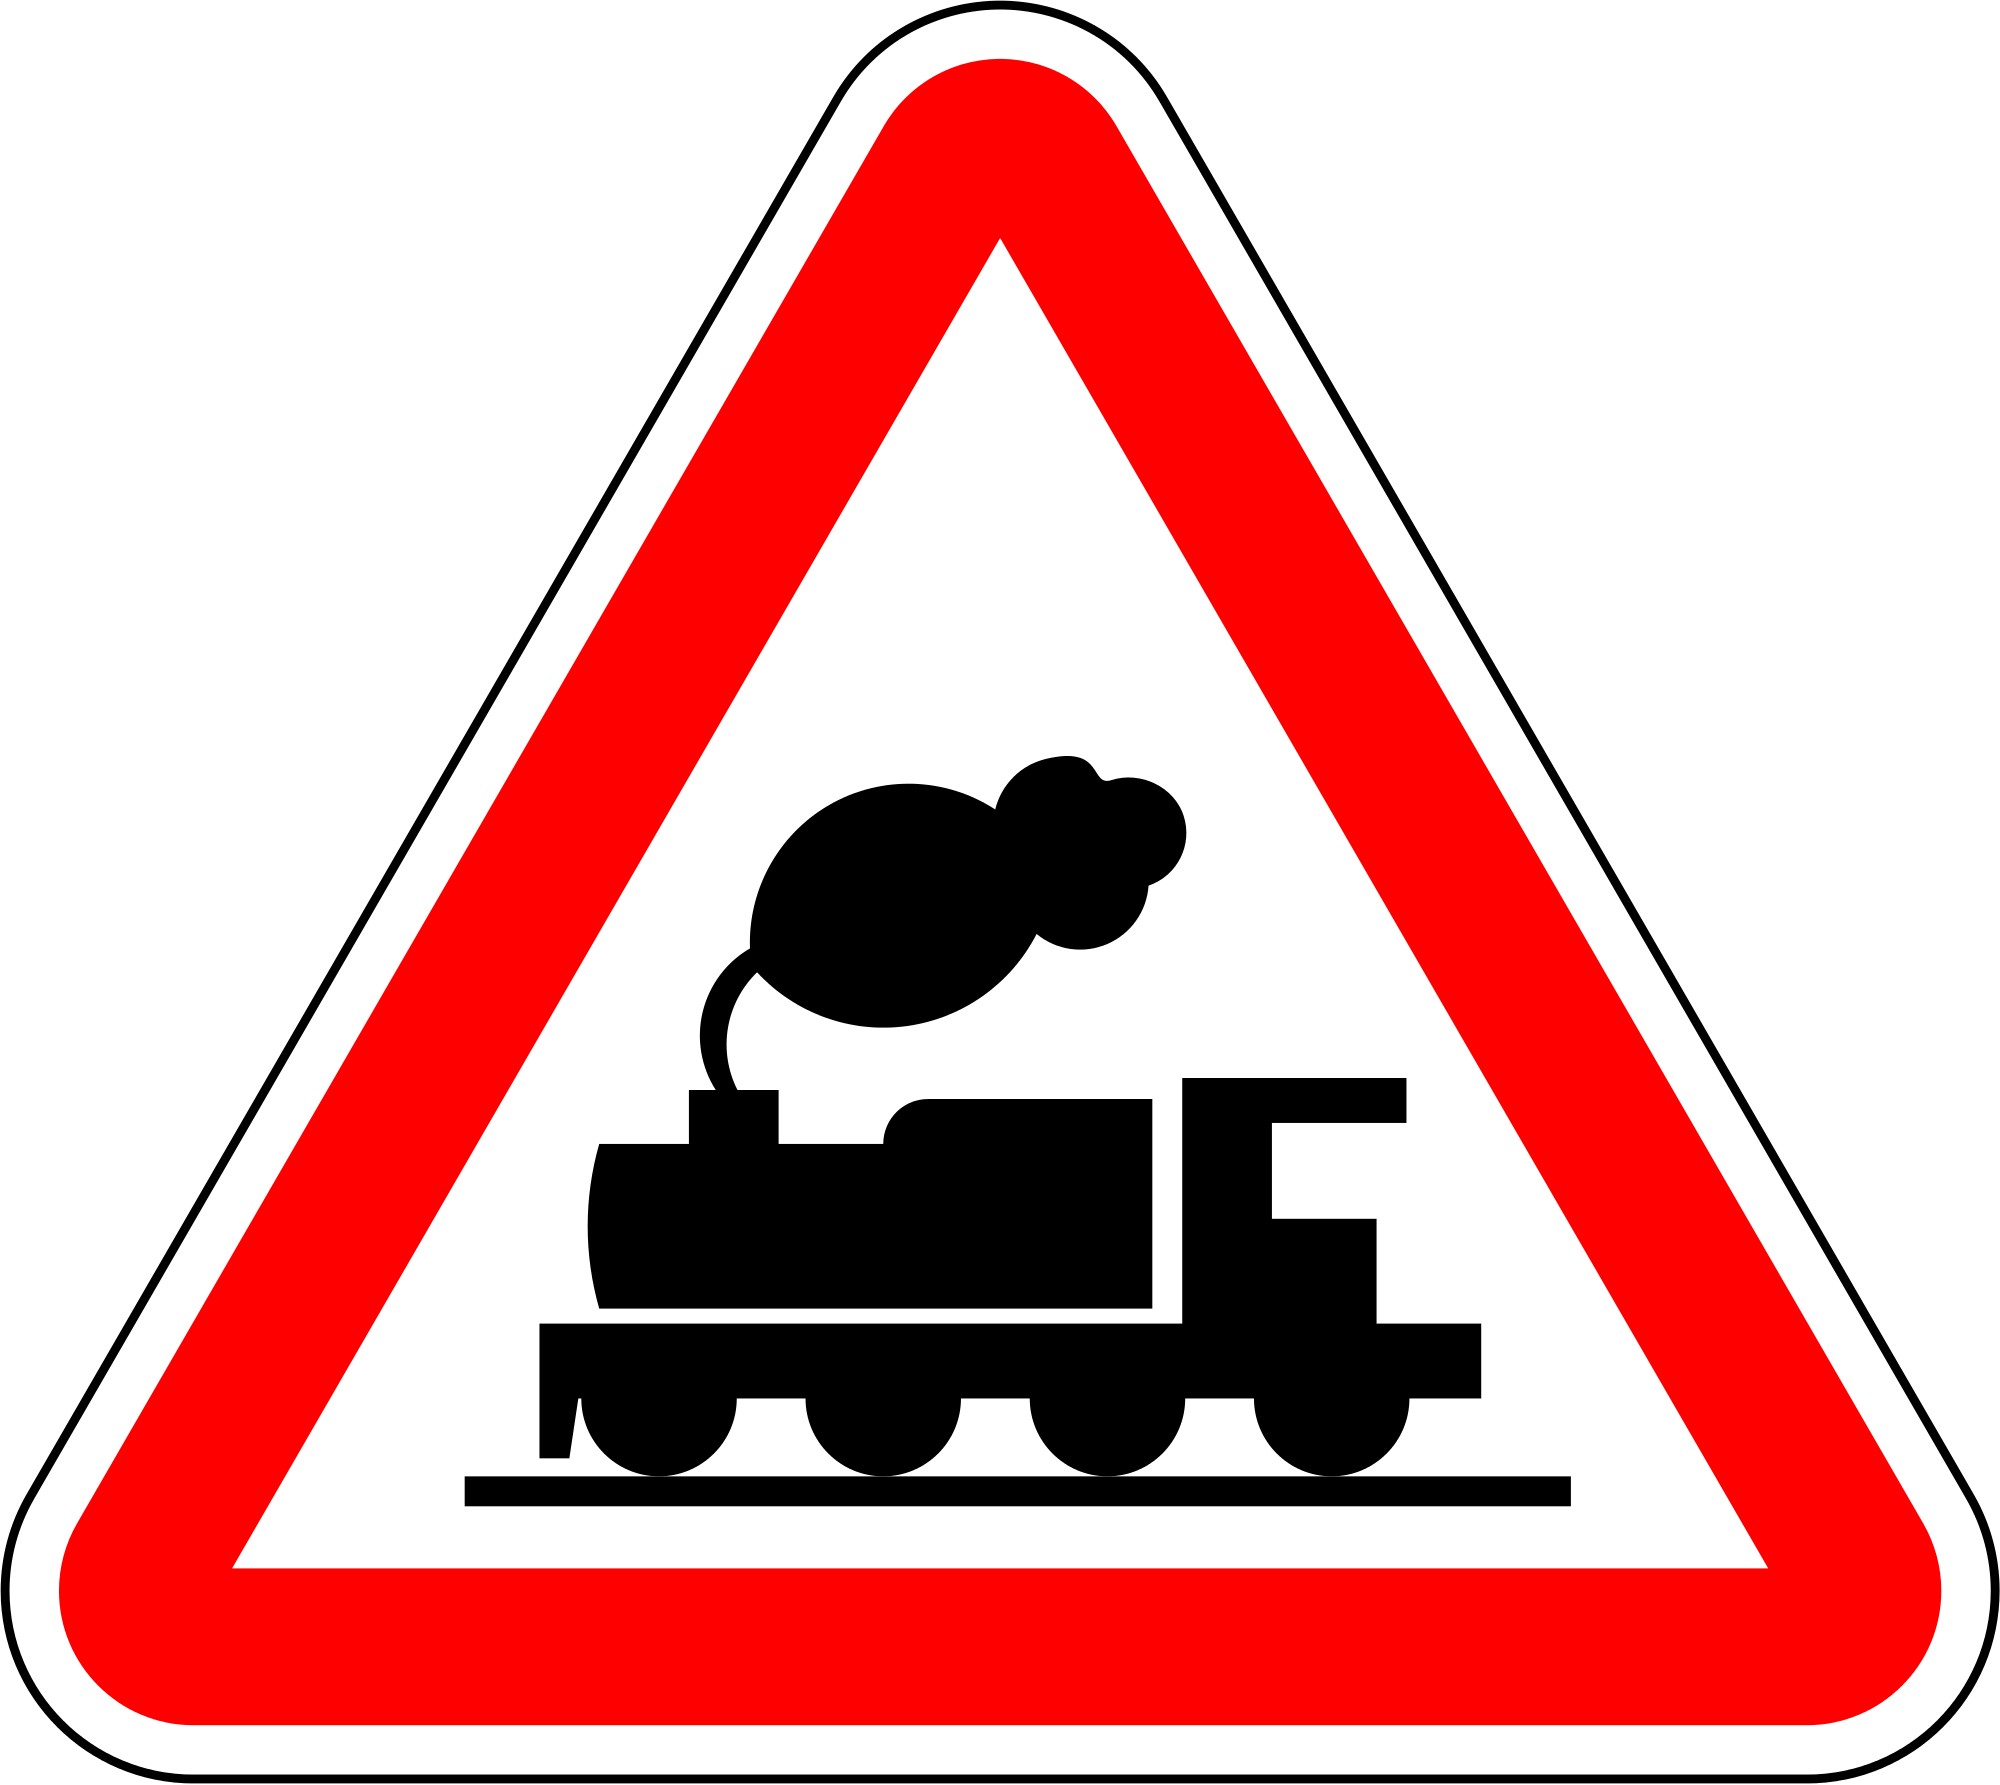 Clipart train sign. File portugal road a